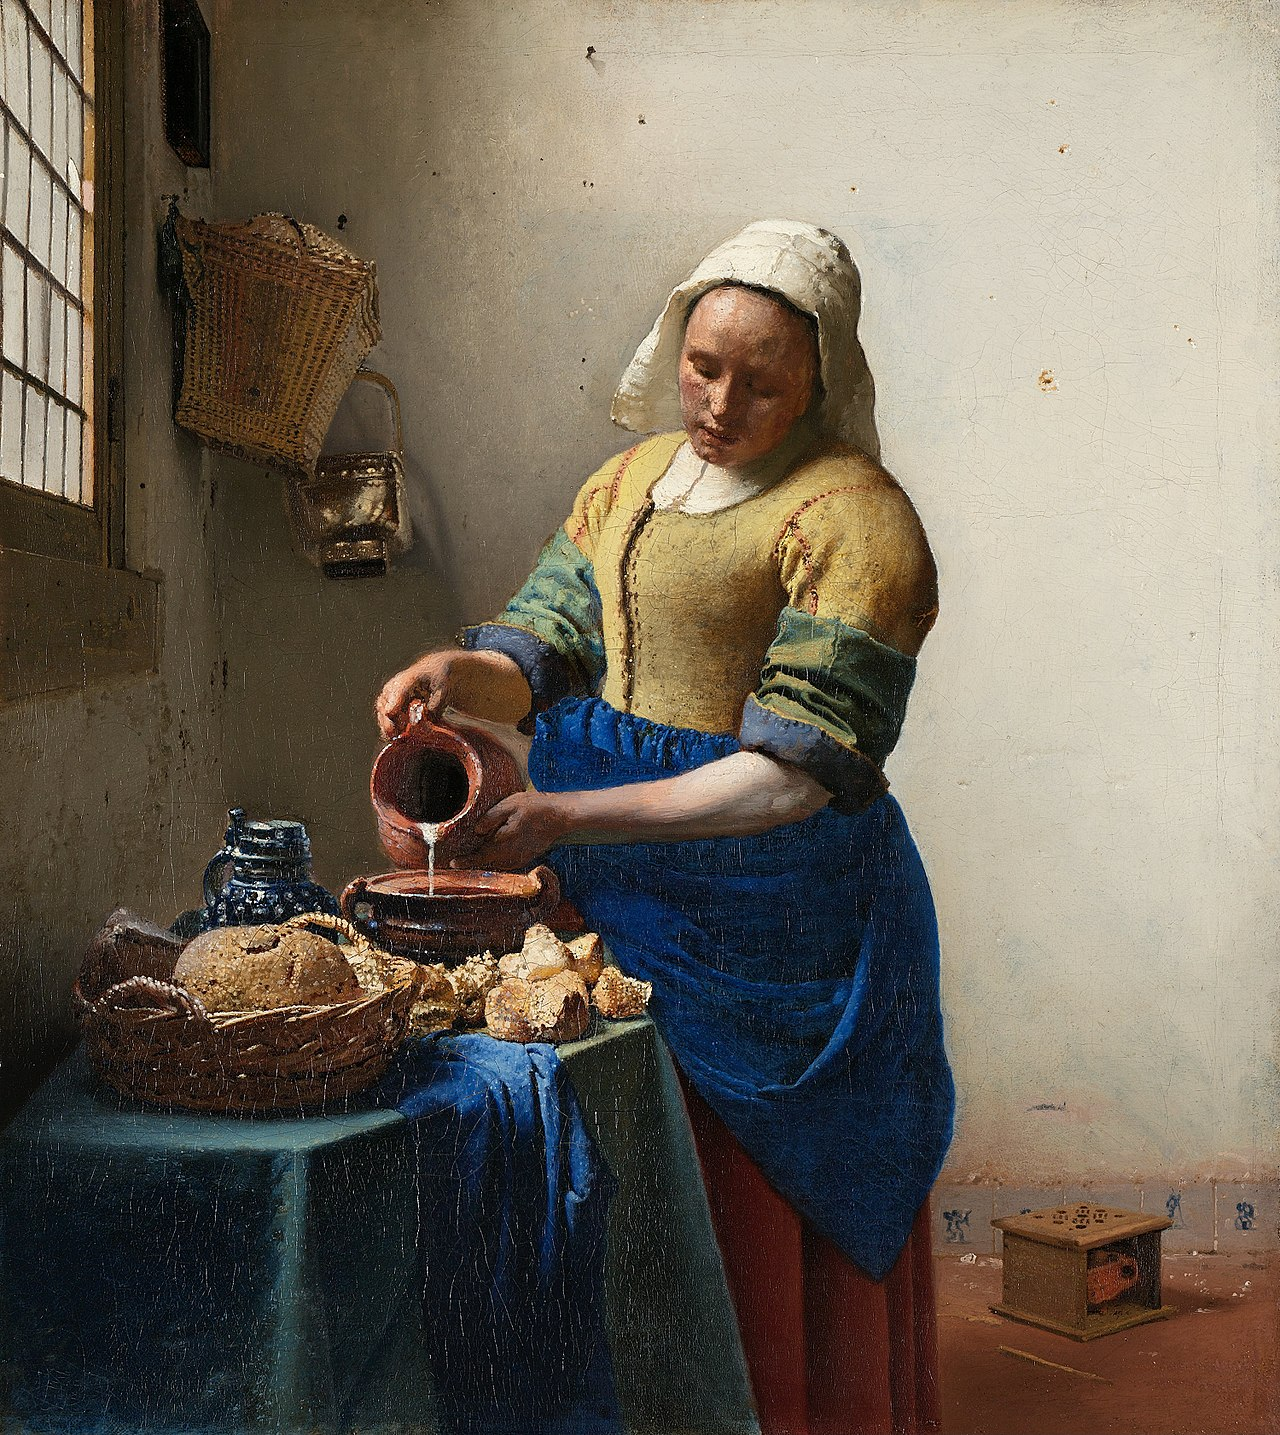 1280px-Johannes_Vermeer_-_Het_melkmeisje_-_Google_Art_Project.jpg